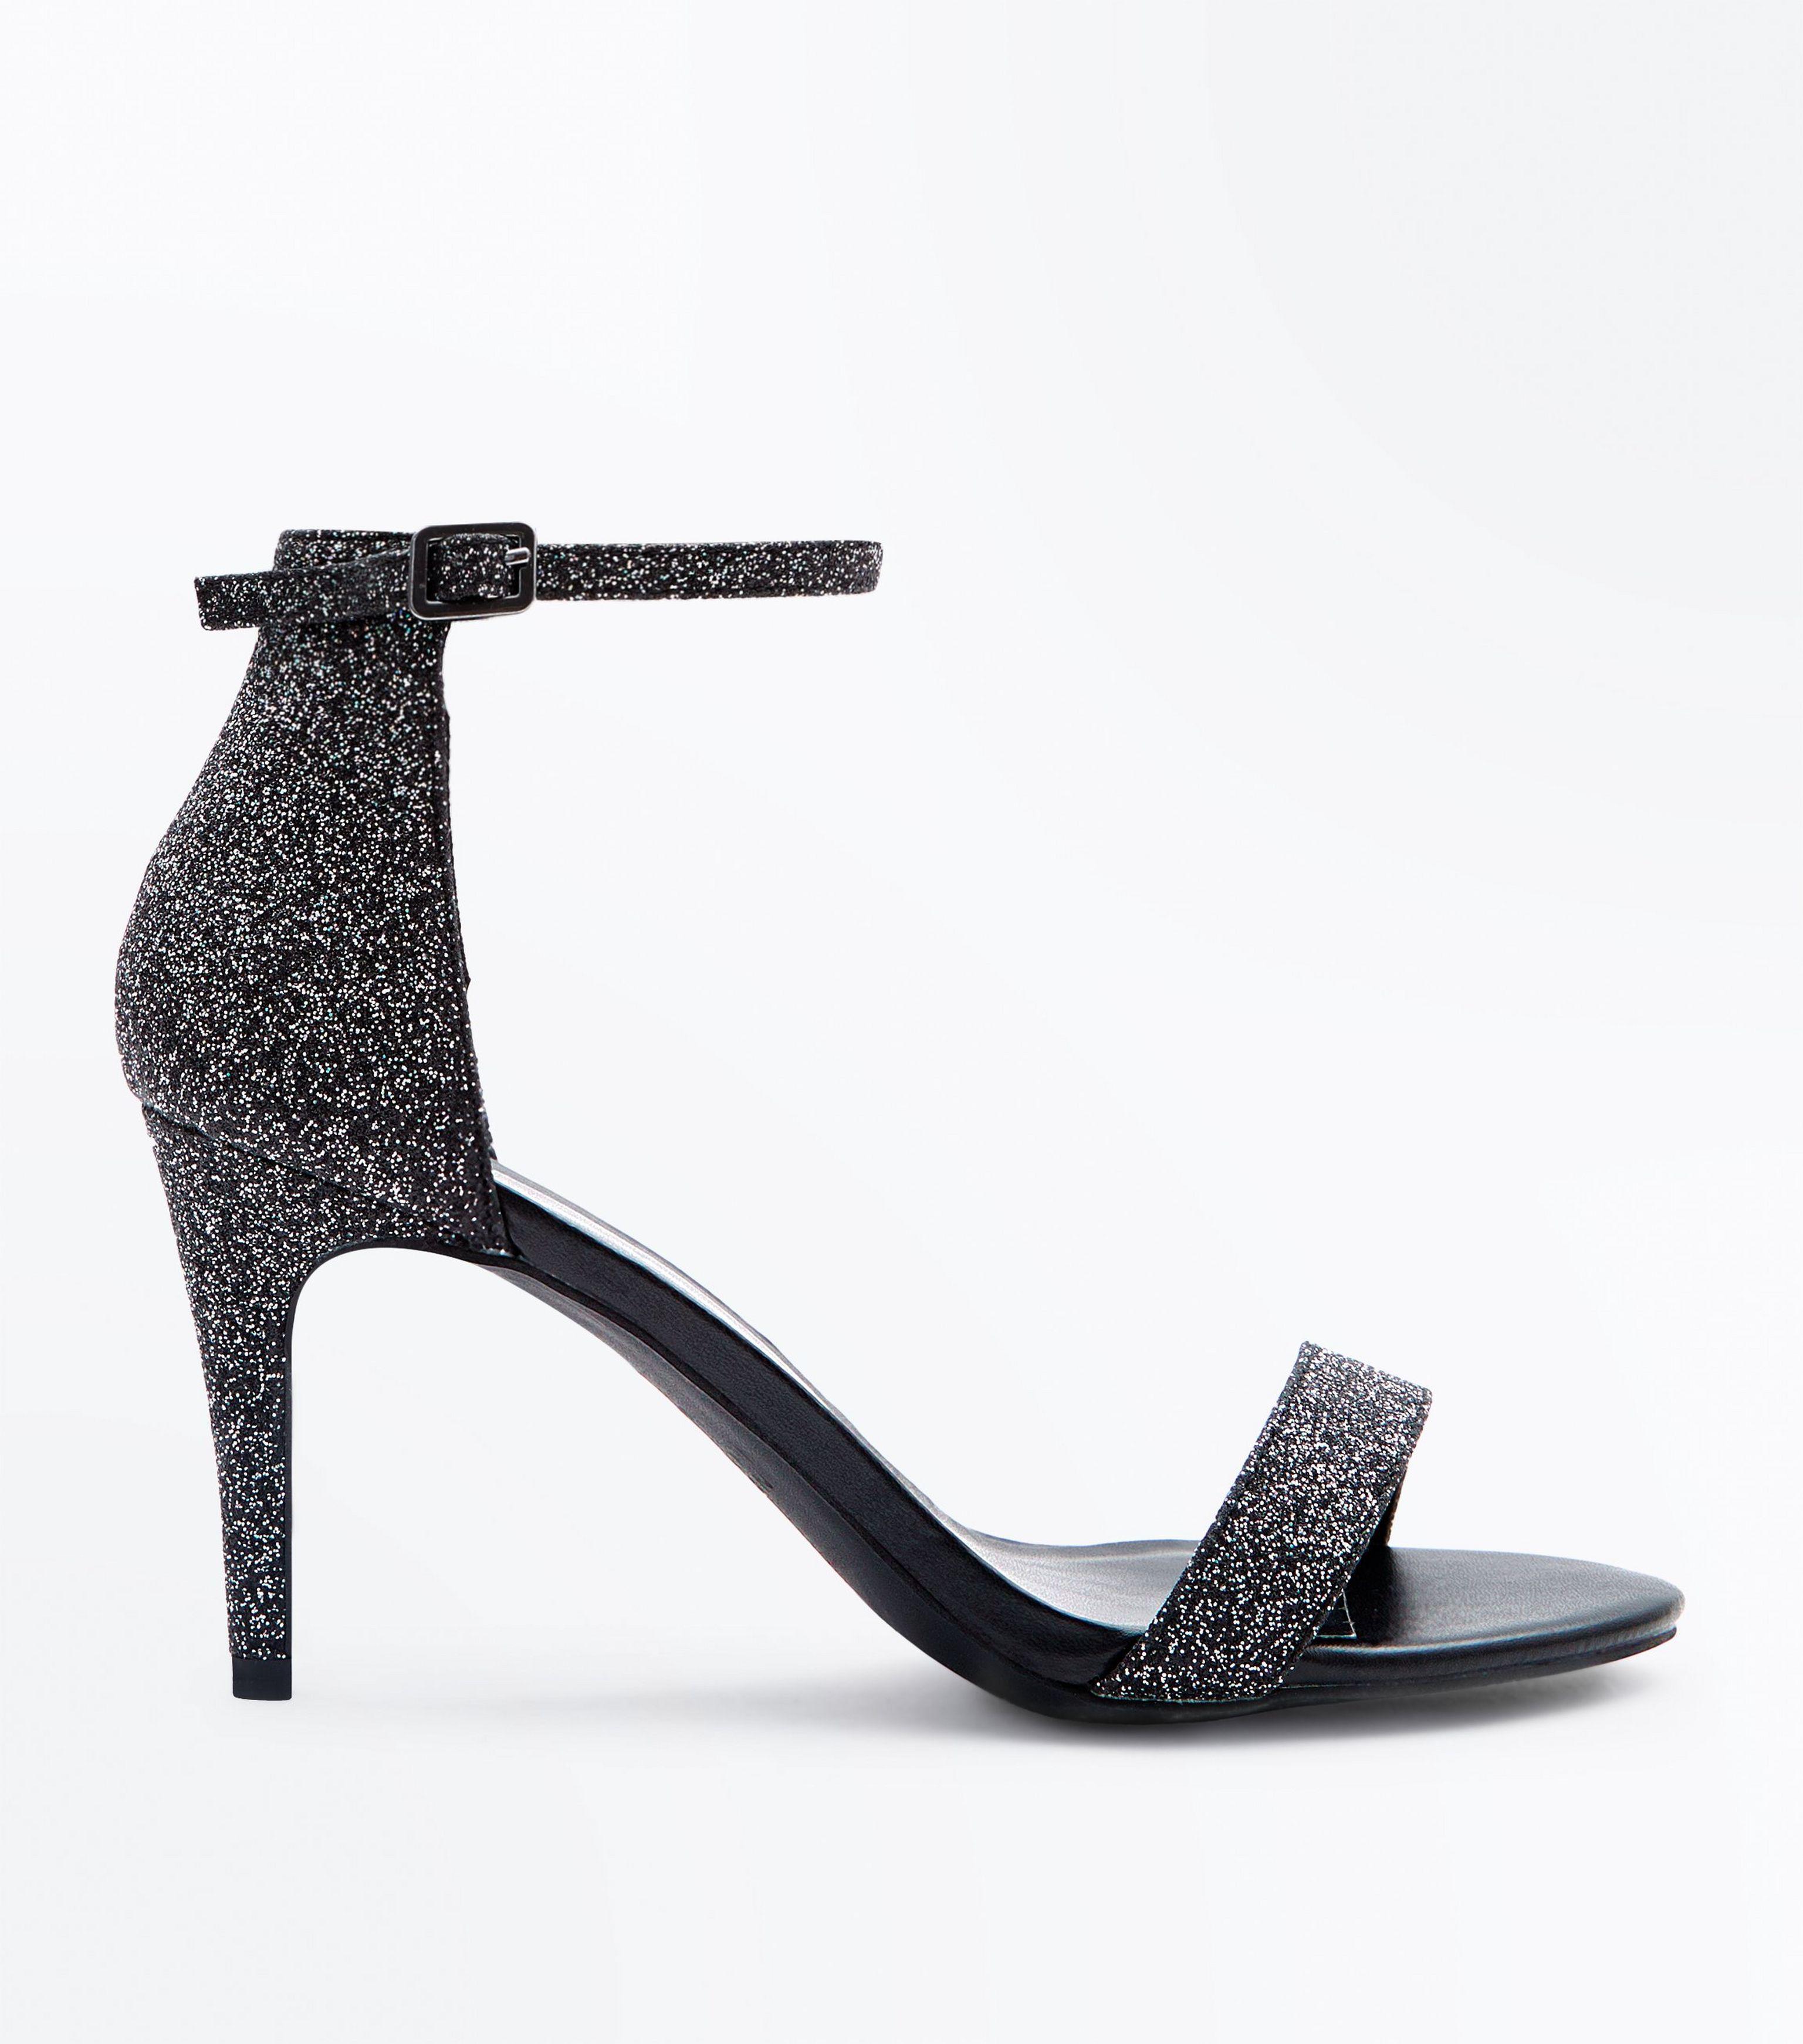 c343e8ff533 New Look Black Glitter Stiletto Heel Sandals in Black - Lyst